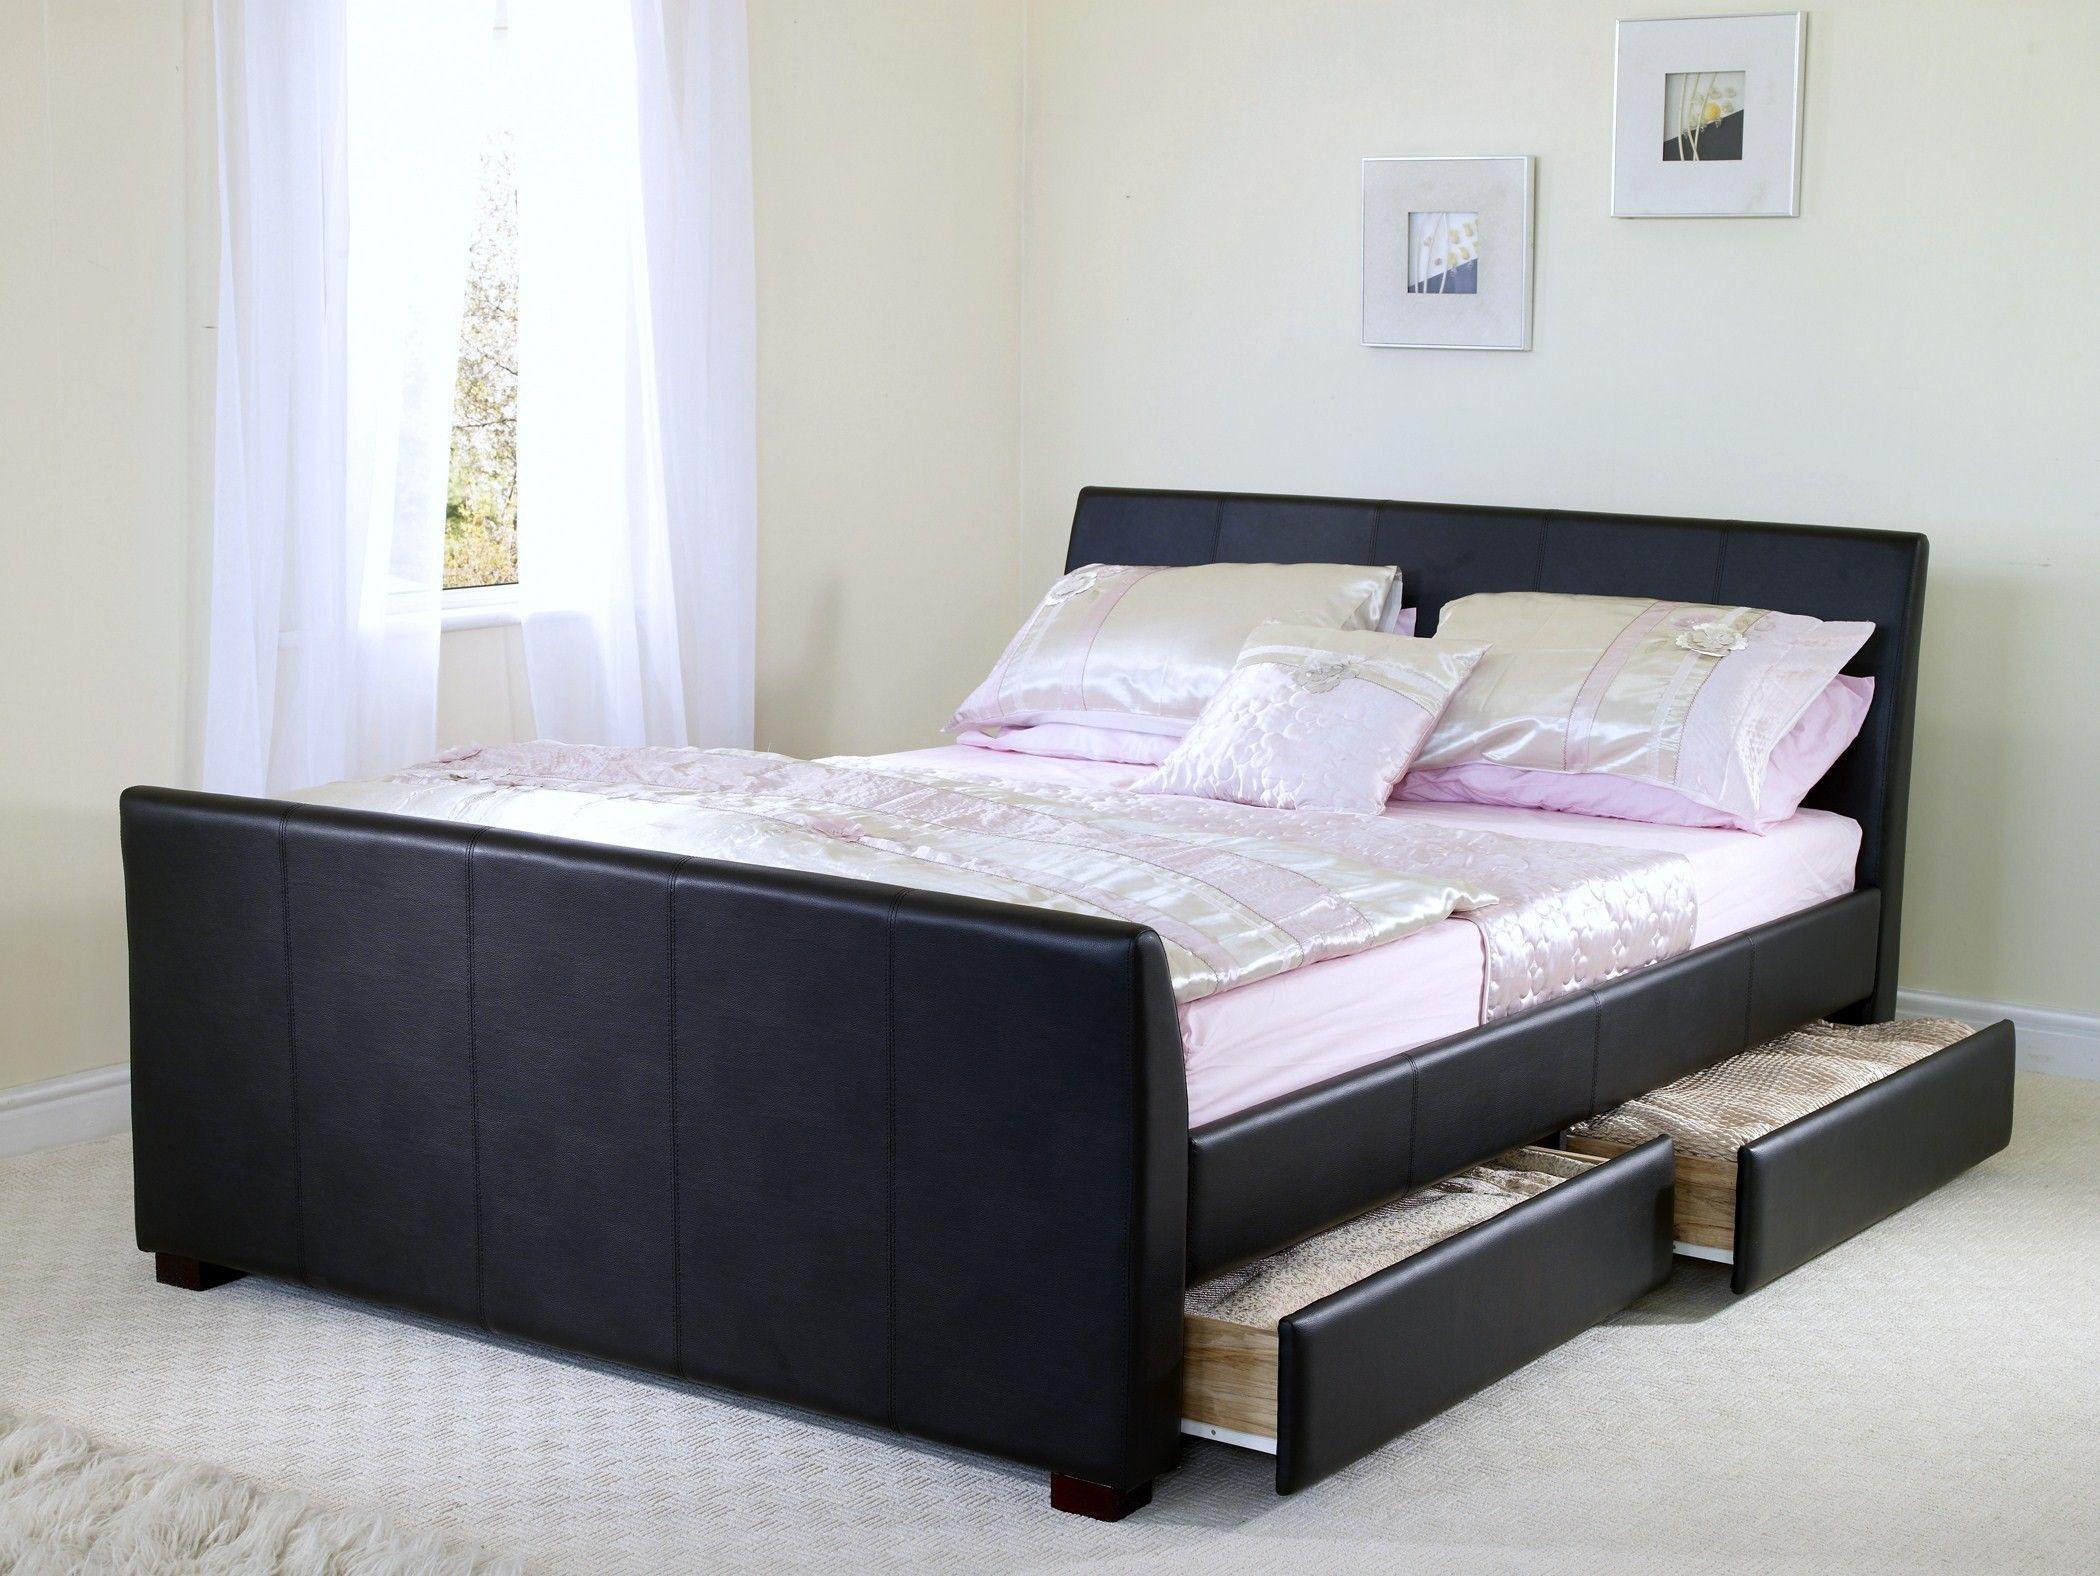 King Size Betten Mit Schubladen Lederbett Plattform Bett